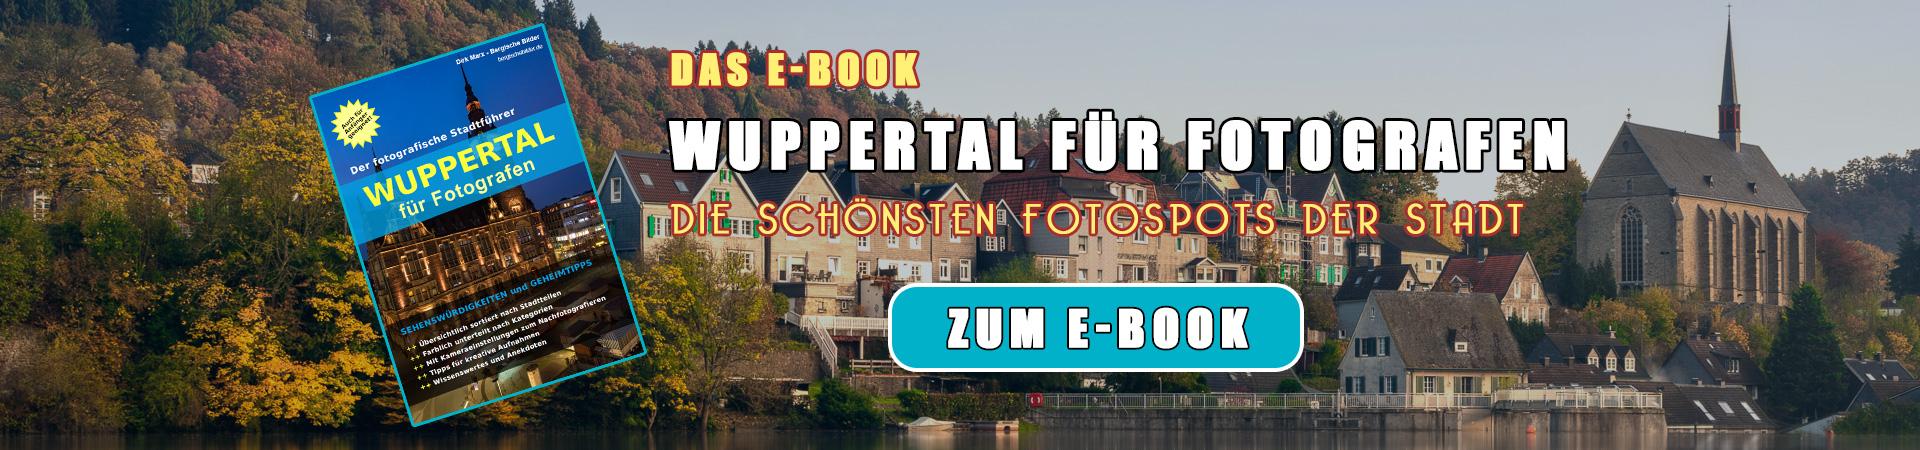 E-Book Wuppertal für Fotografen